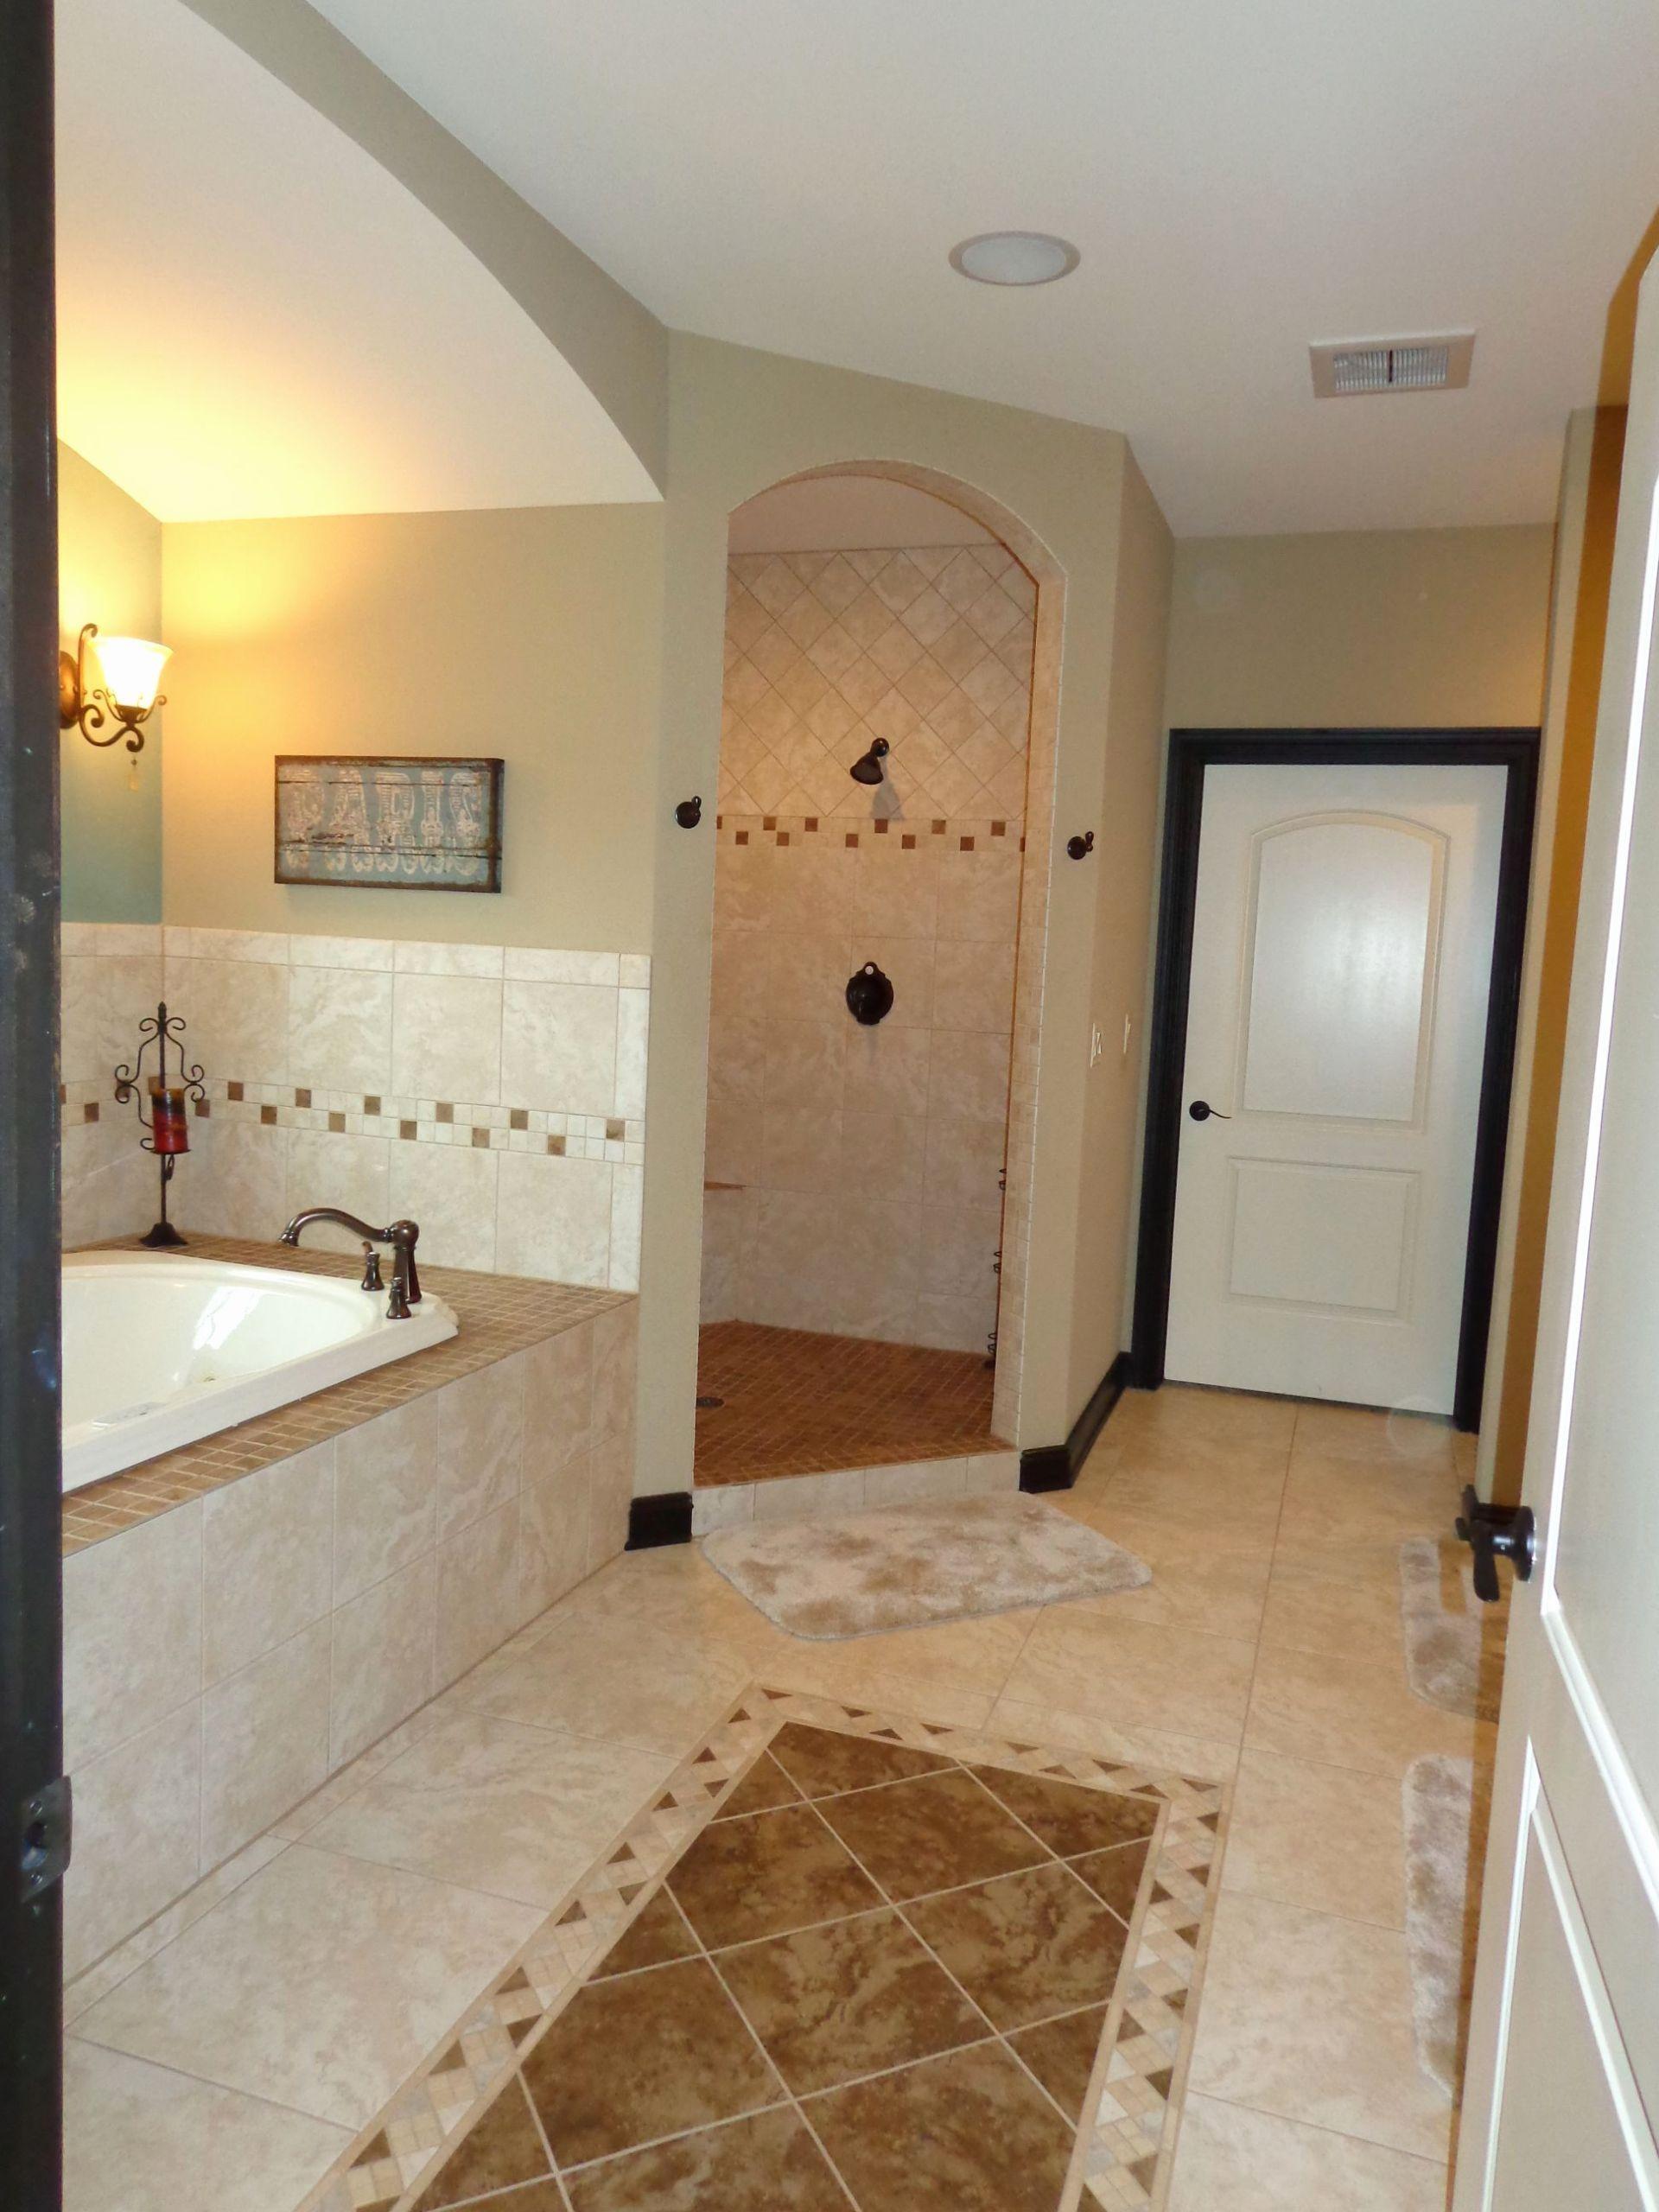 Bathroom Closet Door Ideas Beautiful Master Bathroom Walk In Double Shower With Bathroom Beautiful C In 2020 Bathroom Design Small Bathroom Design Shower Remodel